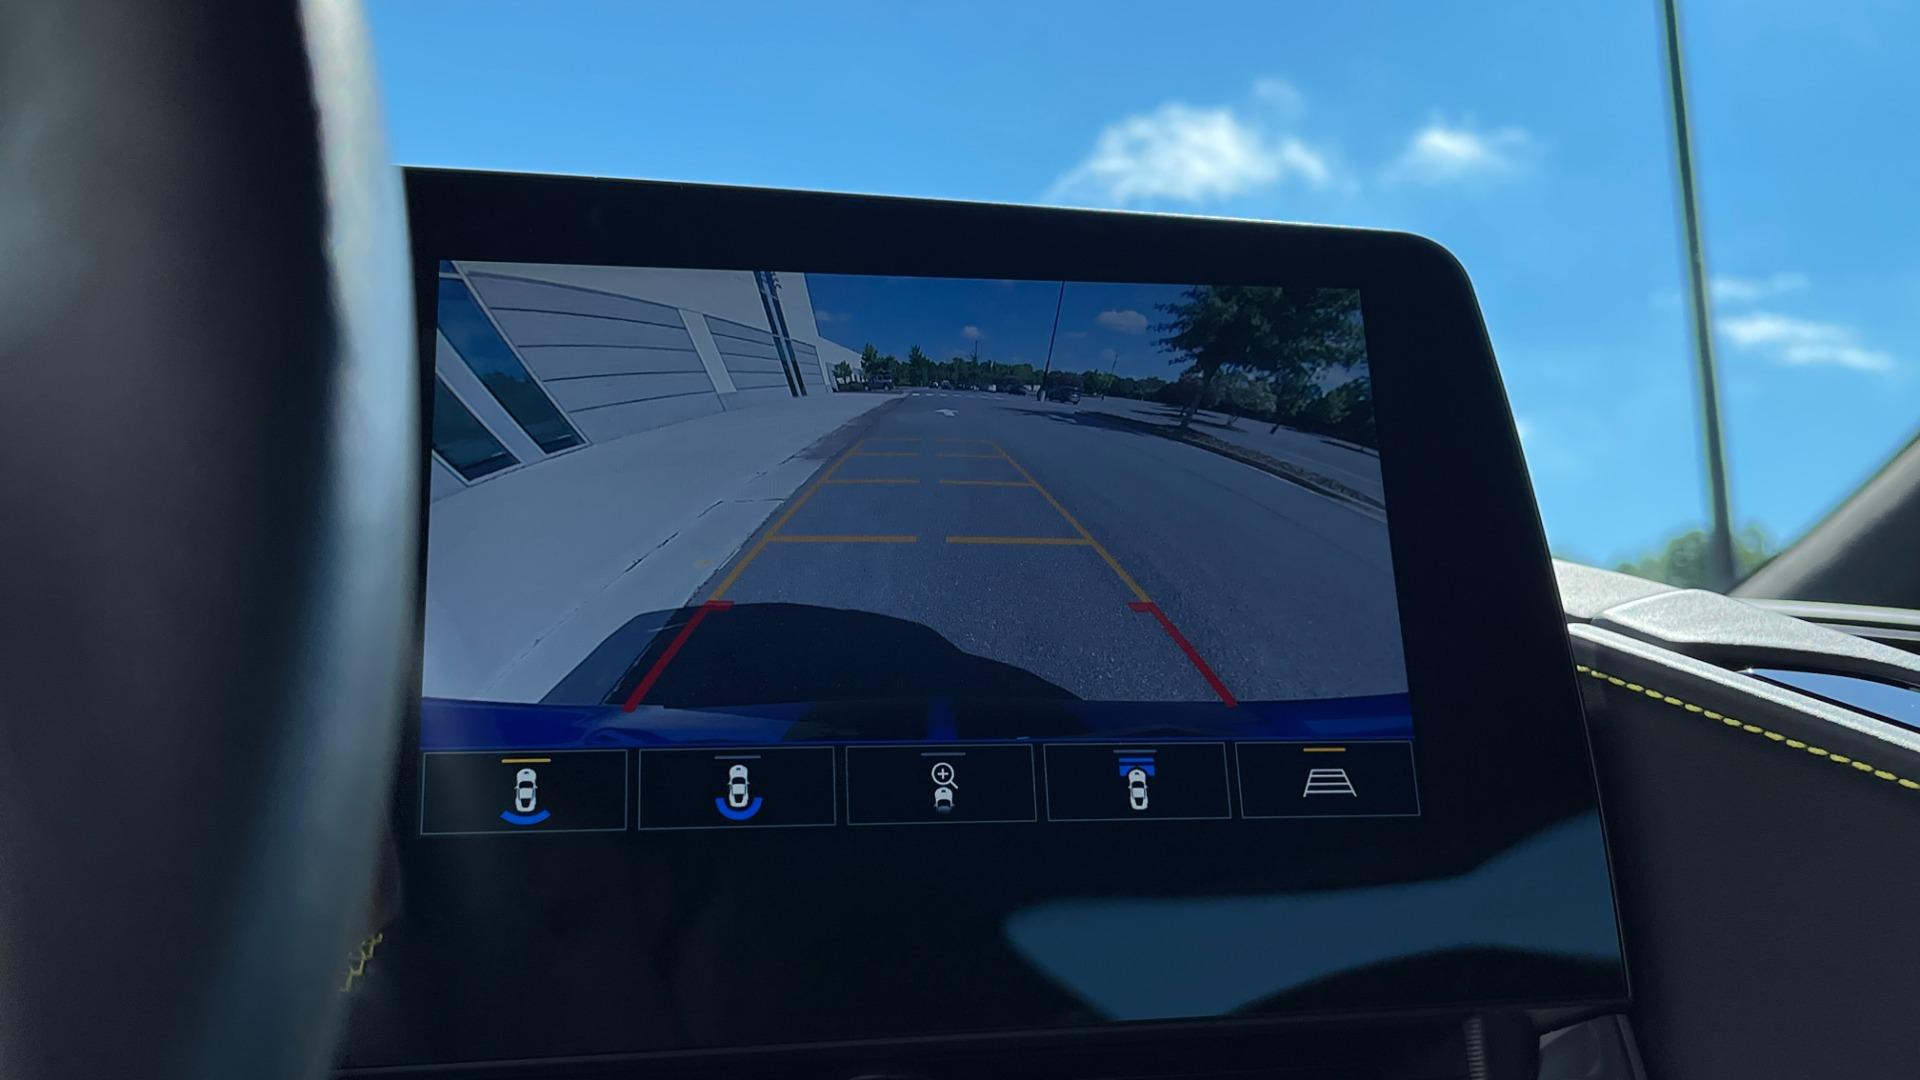 Used 2021 Chevrolet CORVETTE STINGRAY 3LT COUPE / 8-SPD / PERF PKG / NAV / BOSE / REARVIEW for sale $110,995 at Formula Imports in Charlotte NC 28227 34